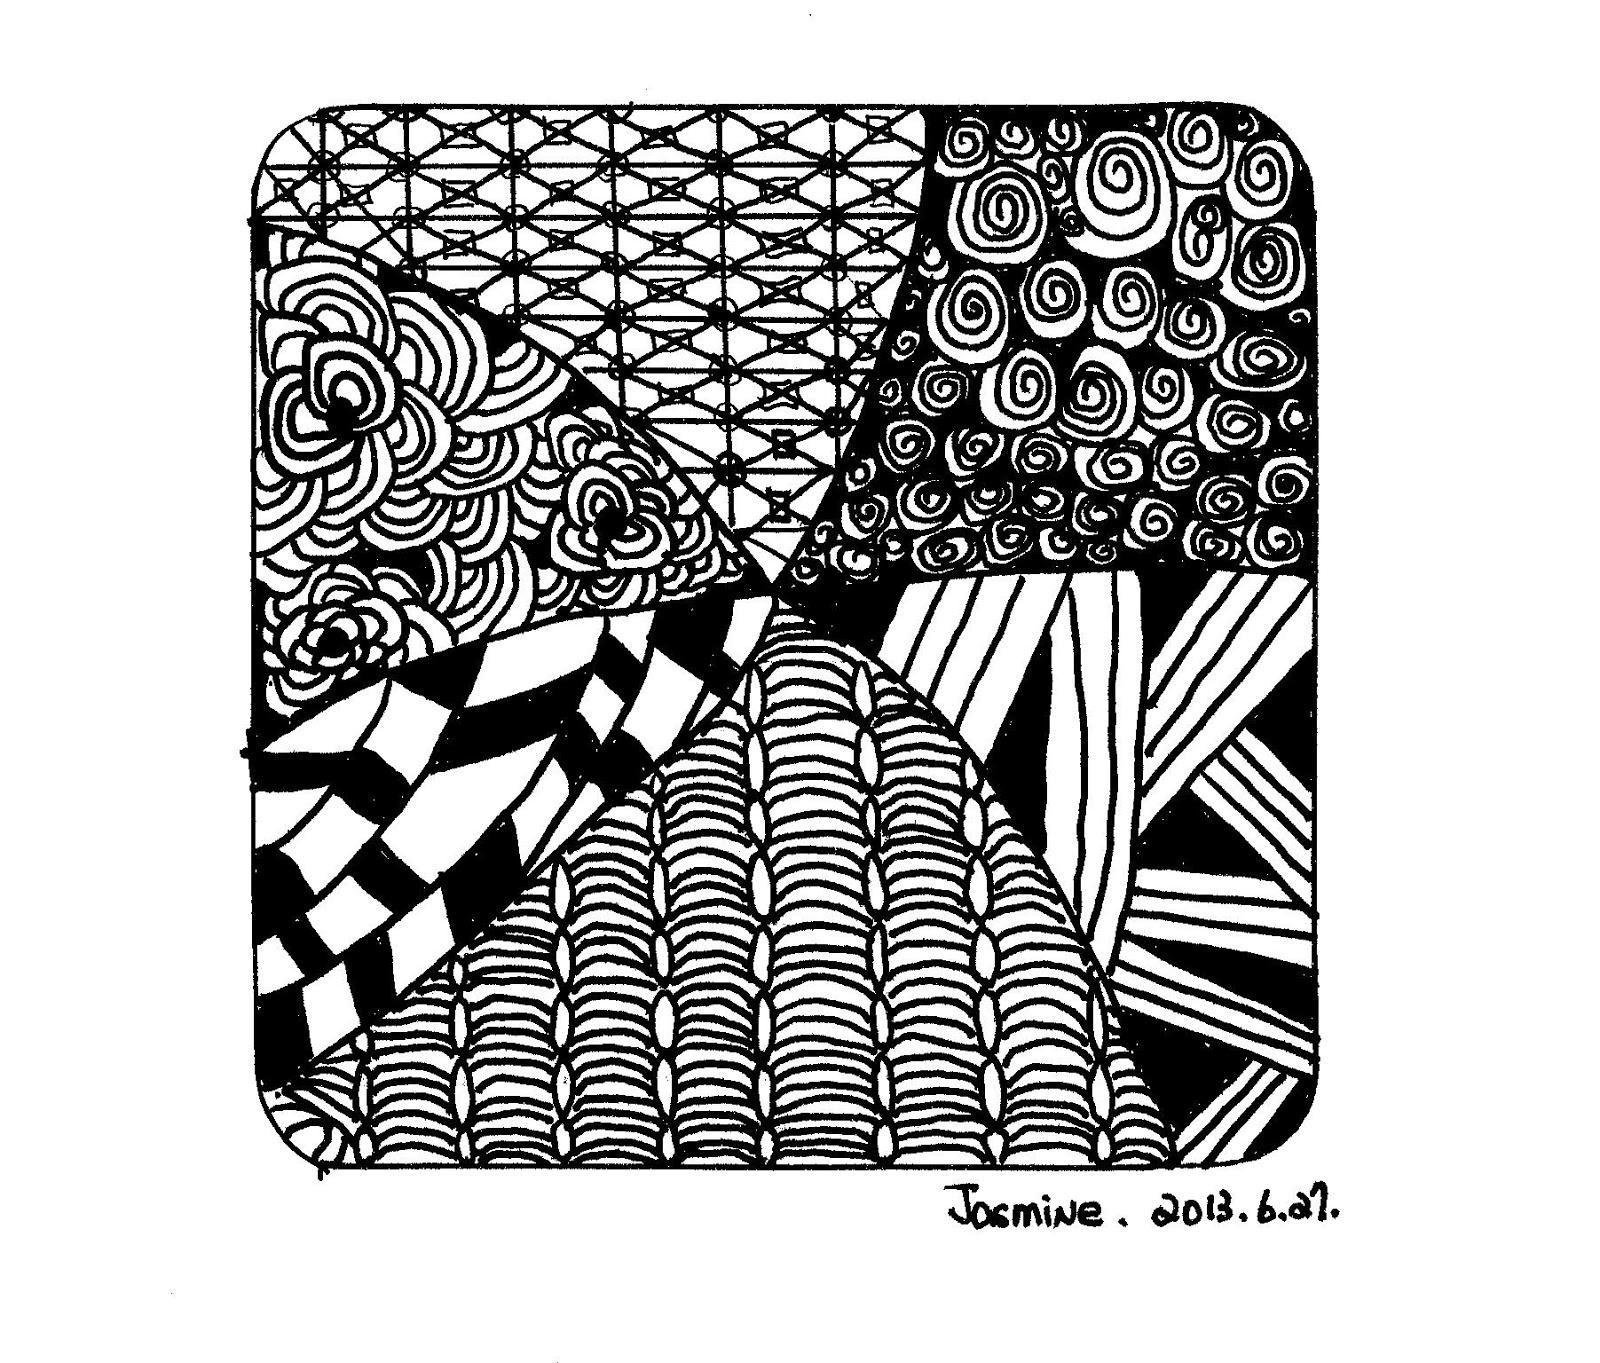 Jasmine's Book: Zentangle 禪繞畫初體驗